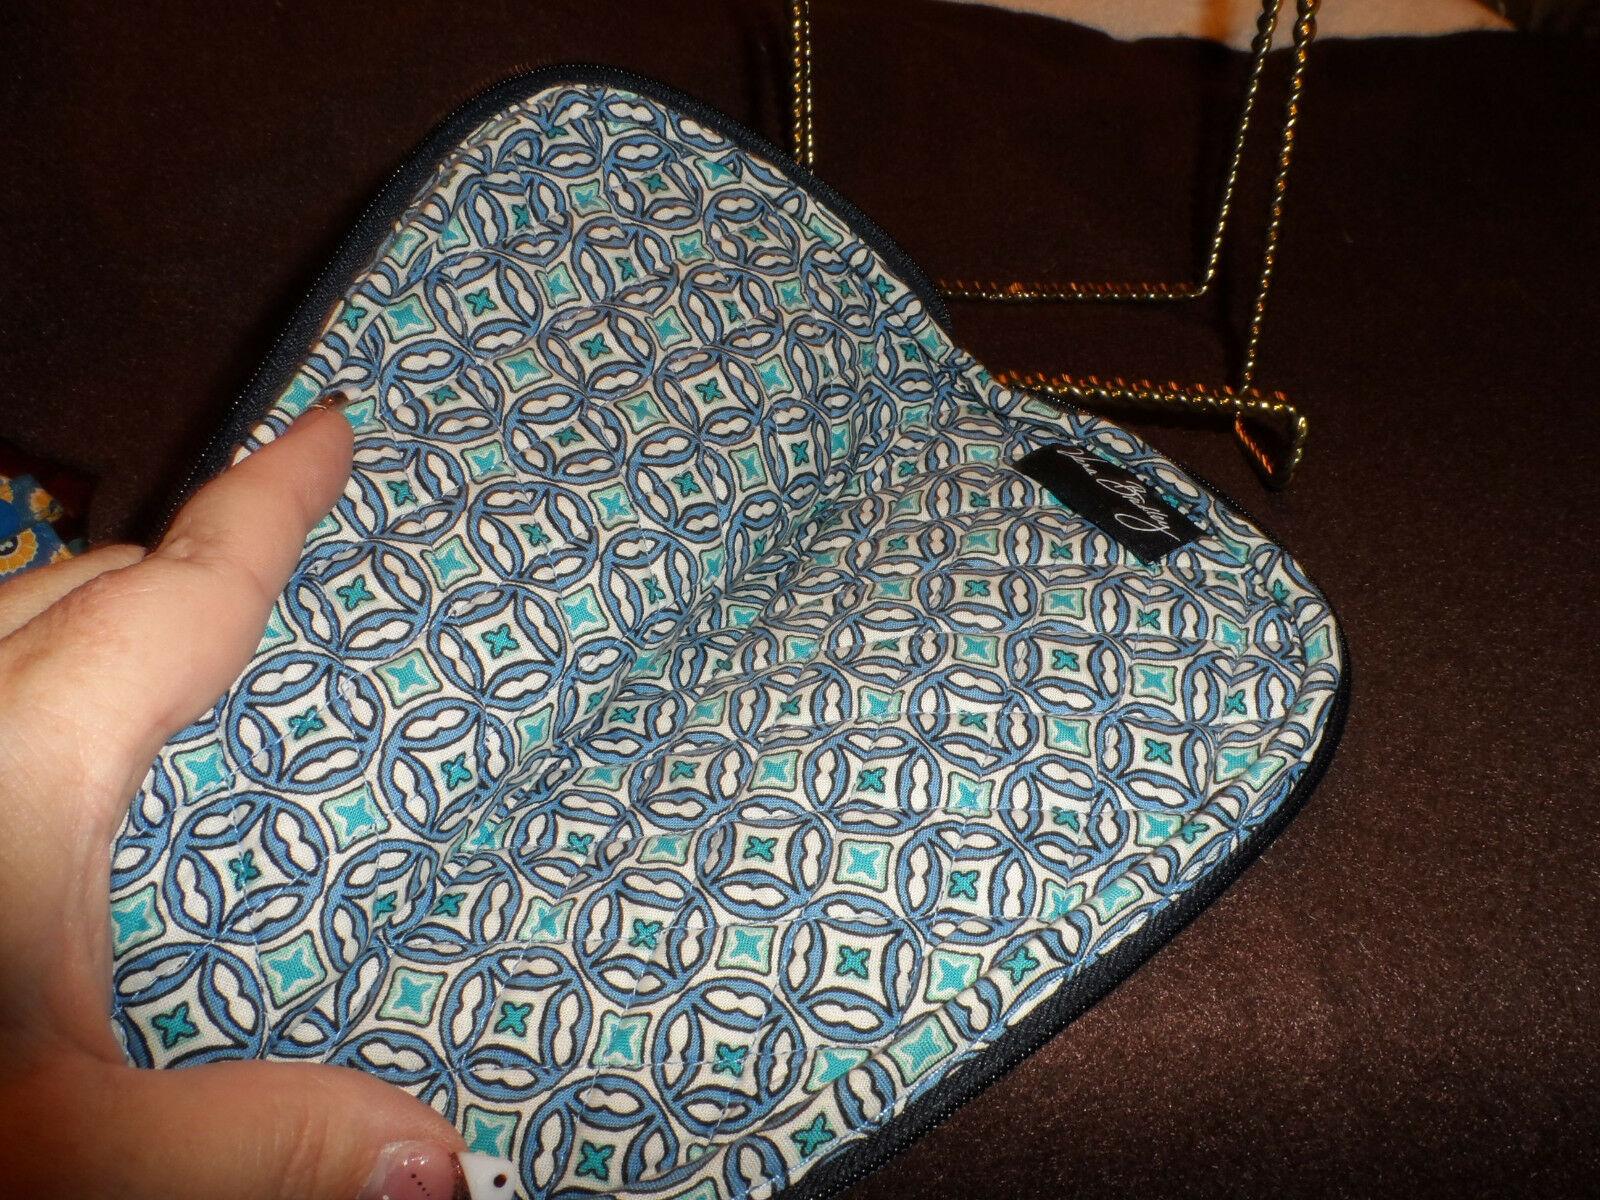 Vera Bradley slipper, lingerie or travel bag in Mod Floral blue